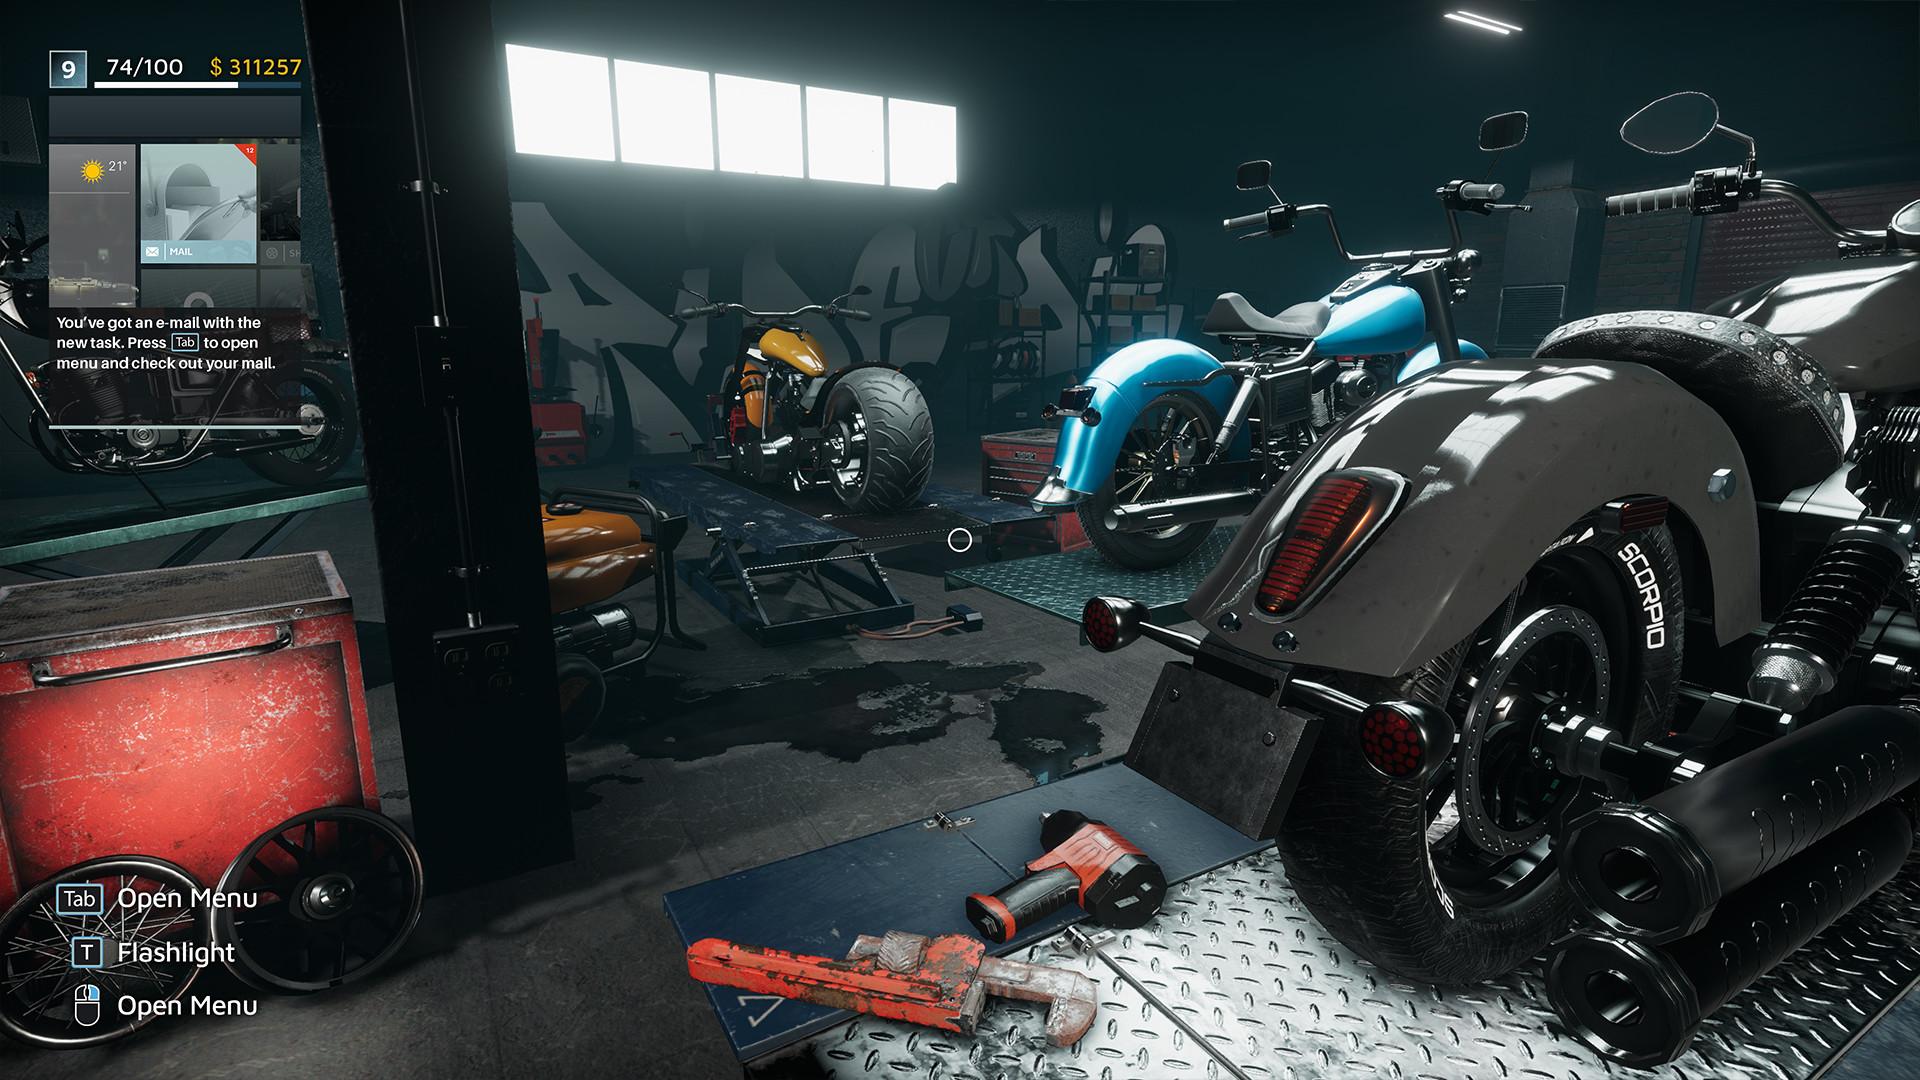 Motorcycle Mechanic Simulator 2021 on Steam